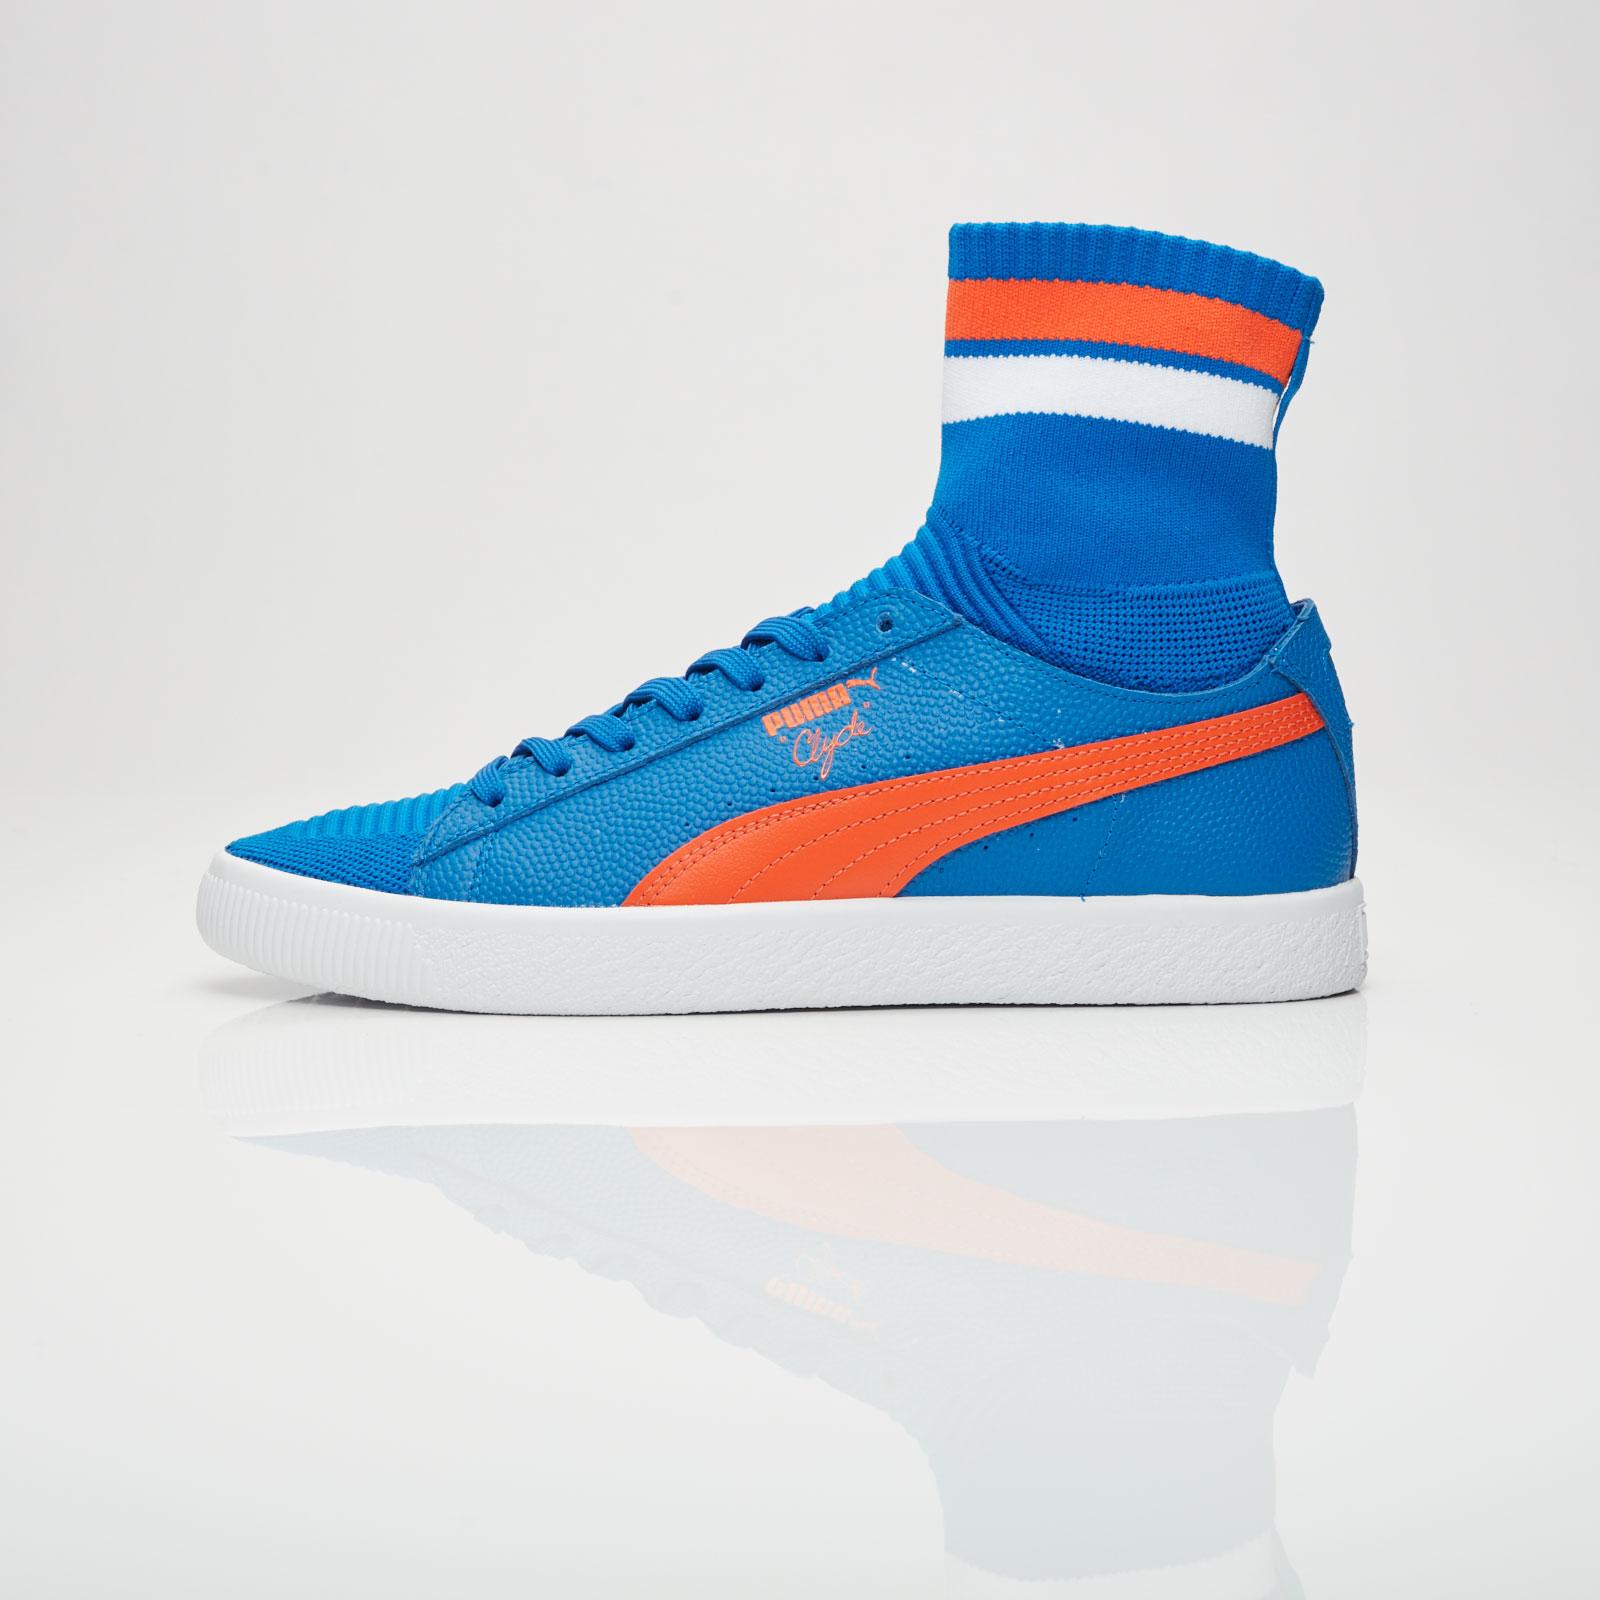 5348a78cb540 Puma Clyde Sock NYC - 364948-03 - Sneakersnstuff